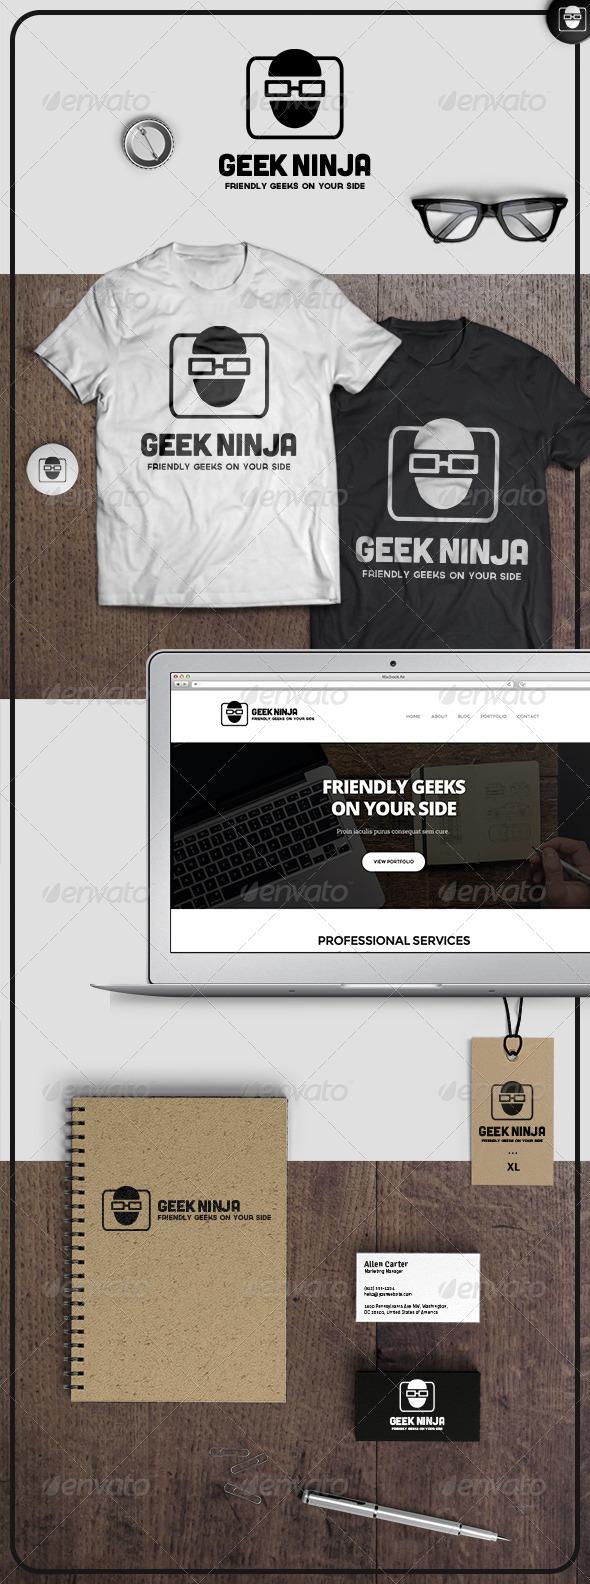 GraphicRiver Geek Ninja Logo 6978531